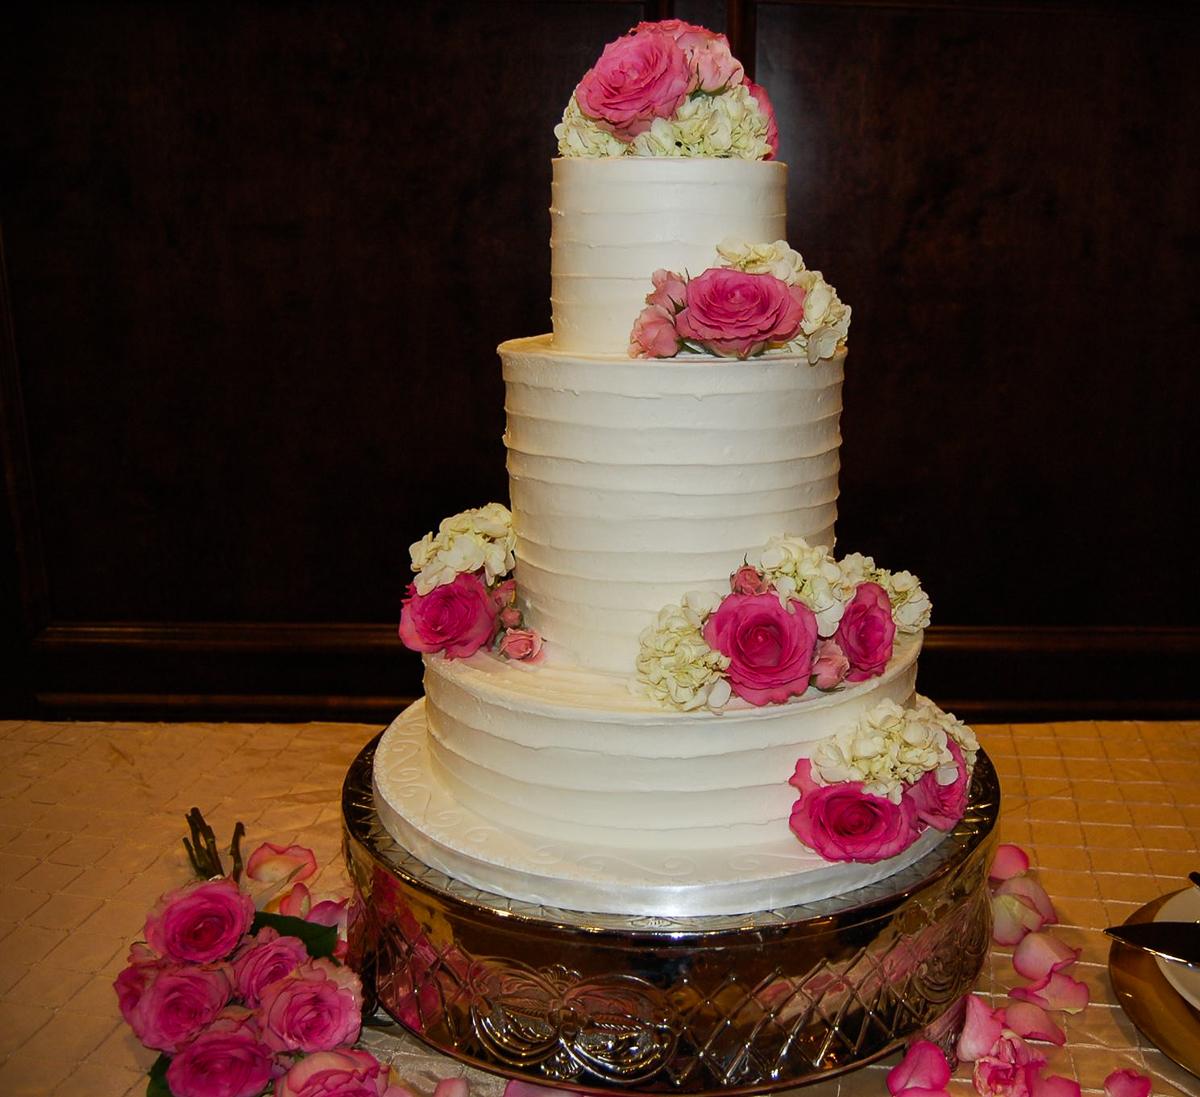 CARMENS_floral_designs_wedding_flowers_houston_005.JPG